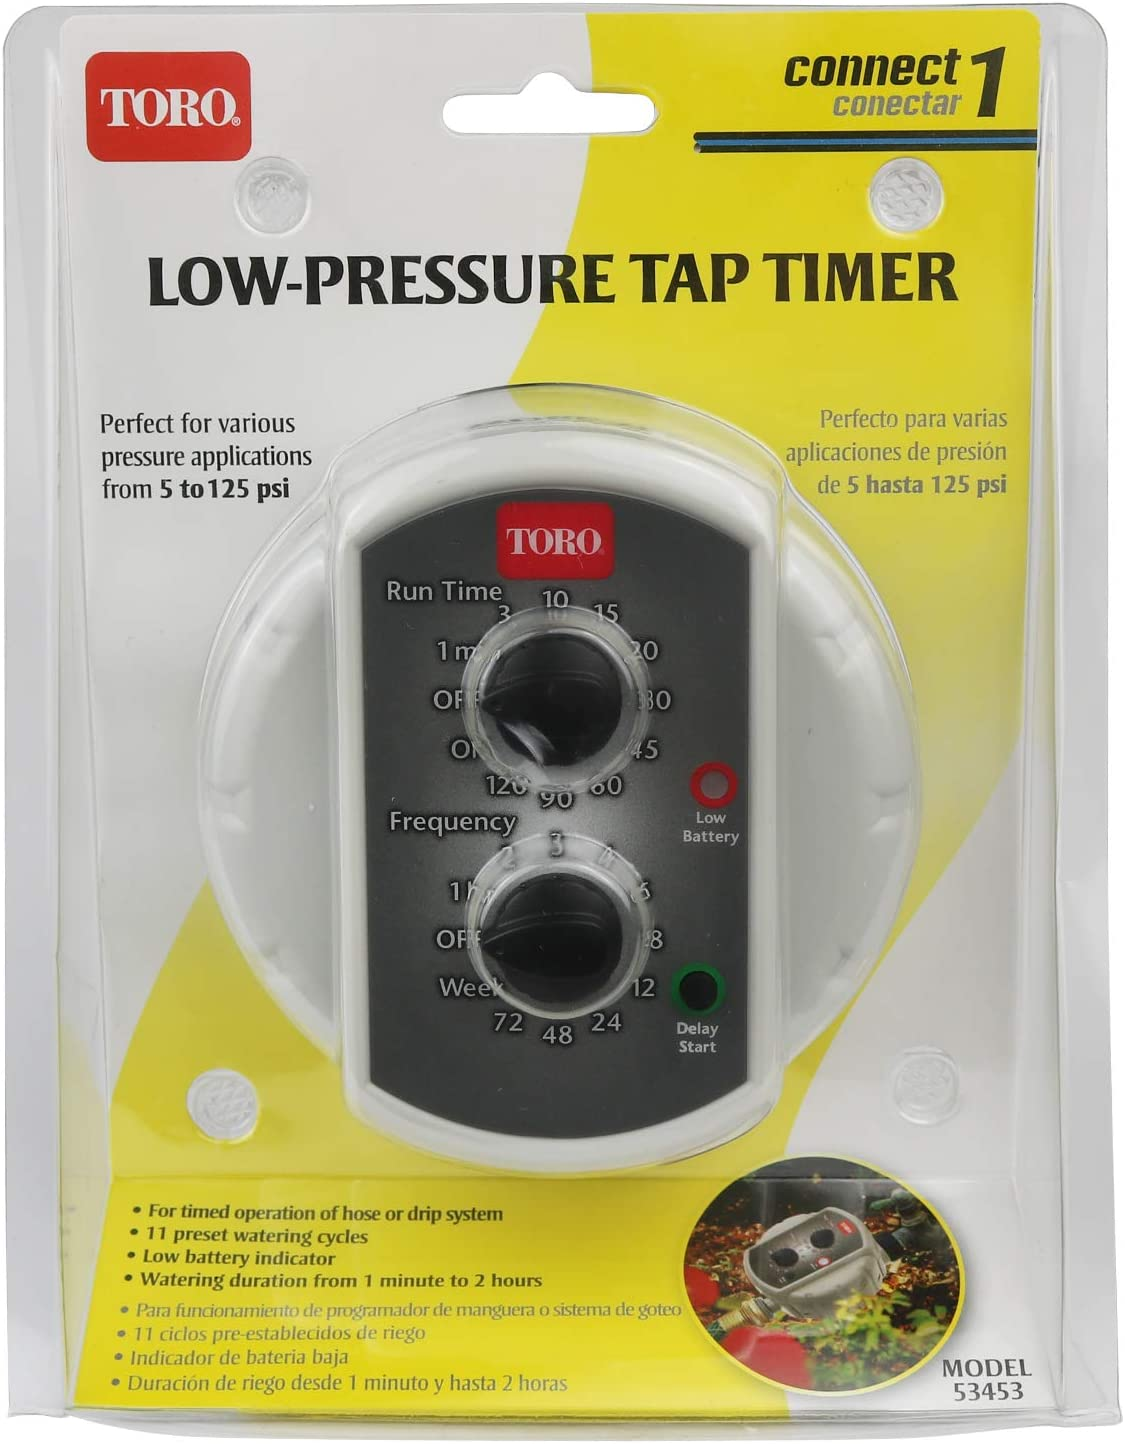 Light Grey Toro 53453 Low-Pressure Tap Timer